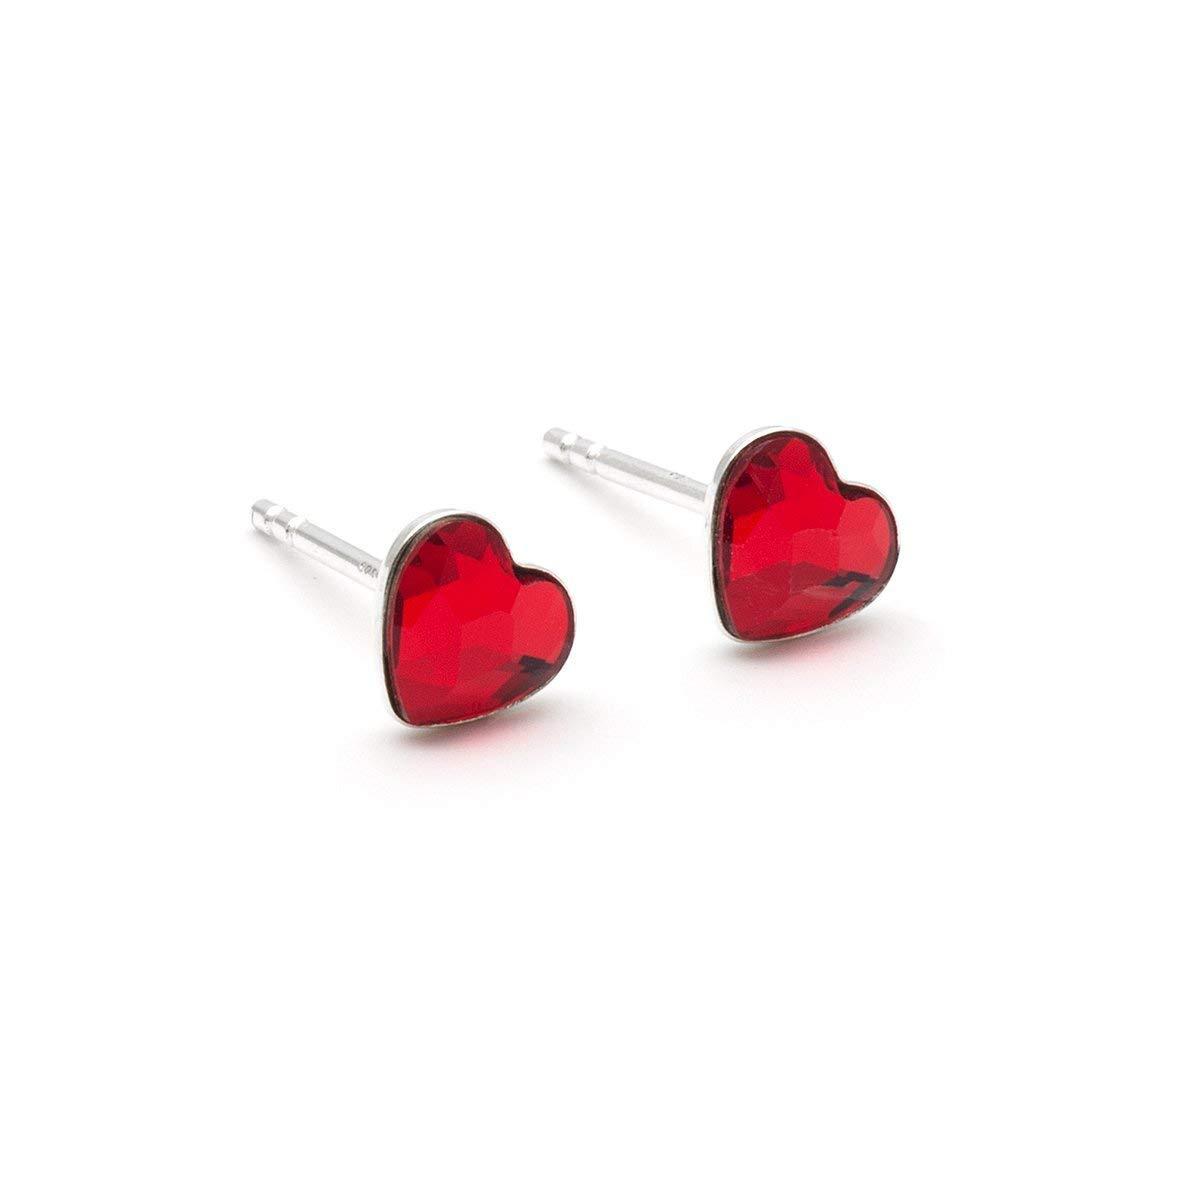 Tiny red Swarovski Heart dainty stud crystal 6mm sterling silver 925 post earrings